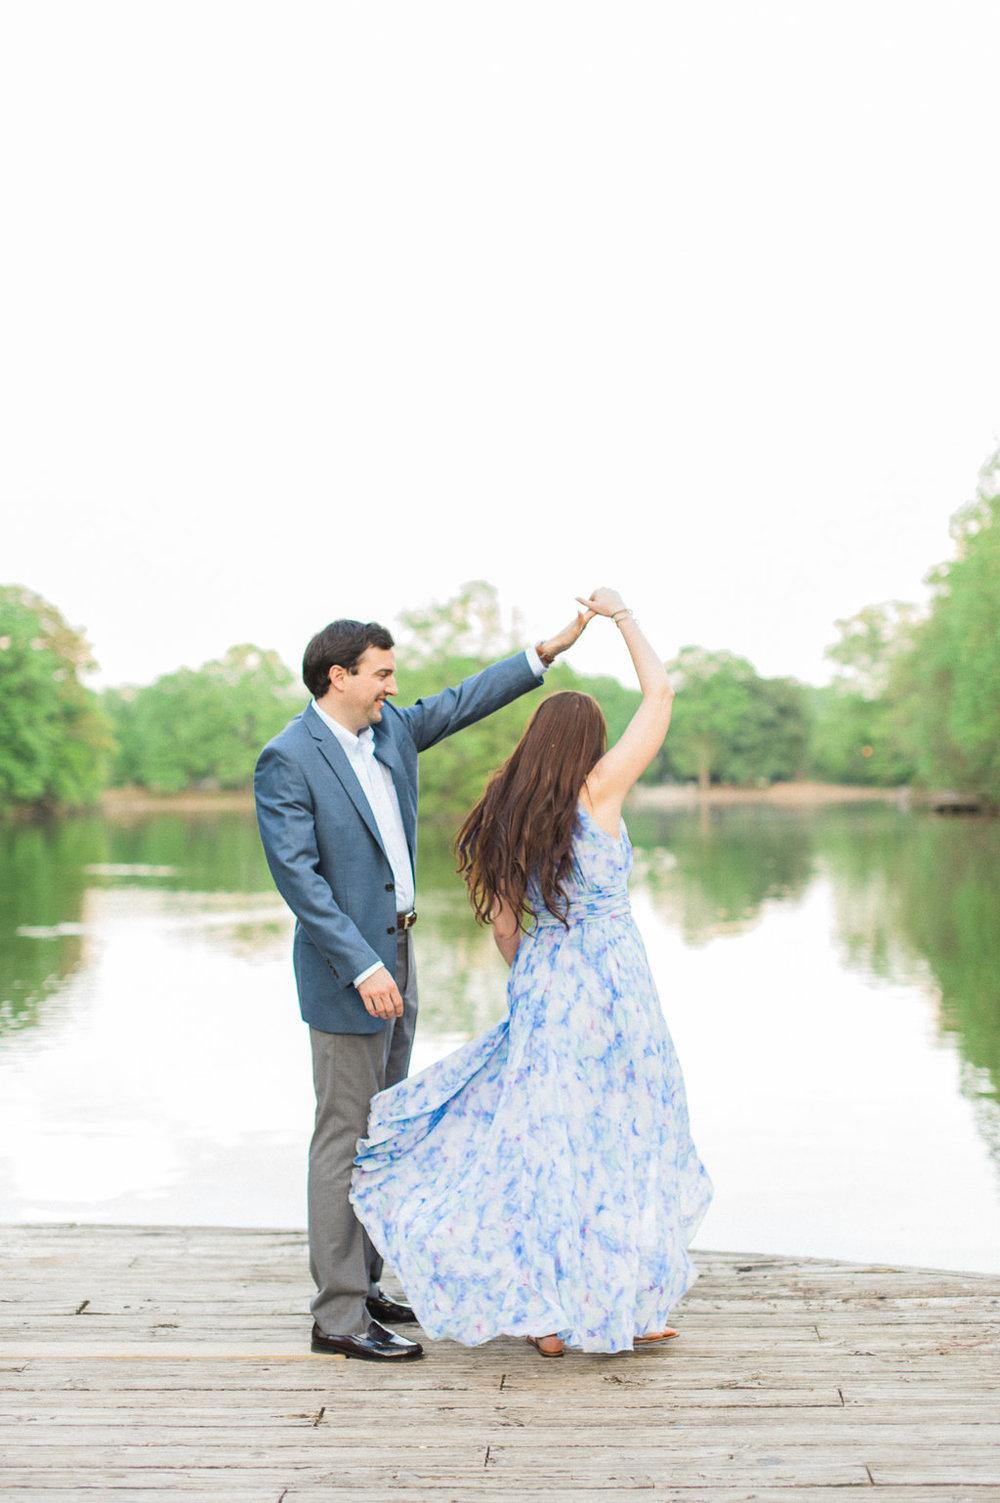 Piedmont-Park-Engagement-atlanta-wedding-photographer-hannah-forsberg-8.jpg